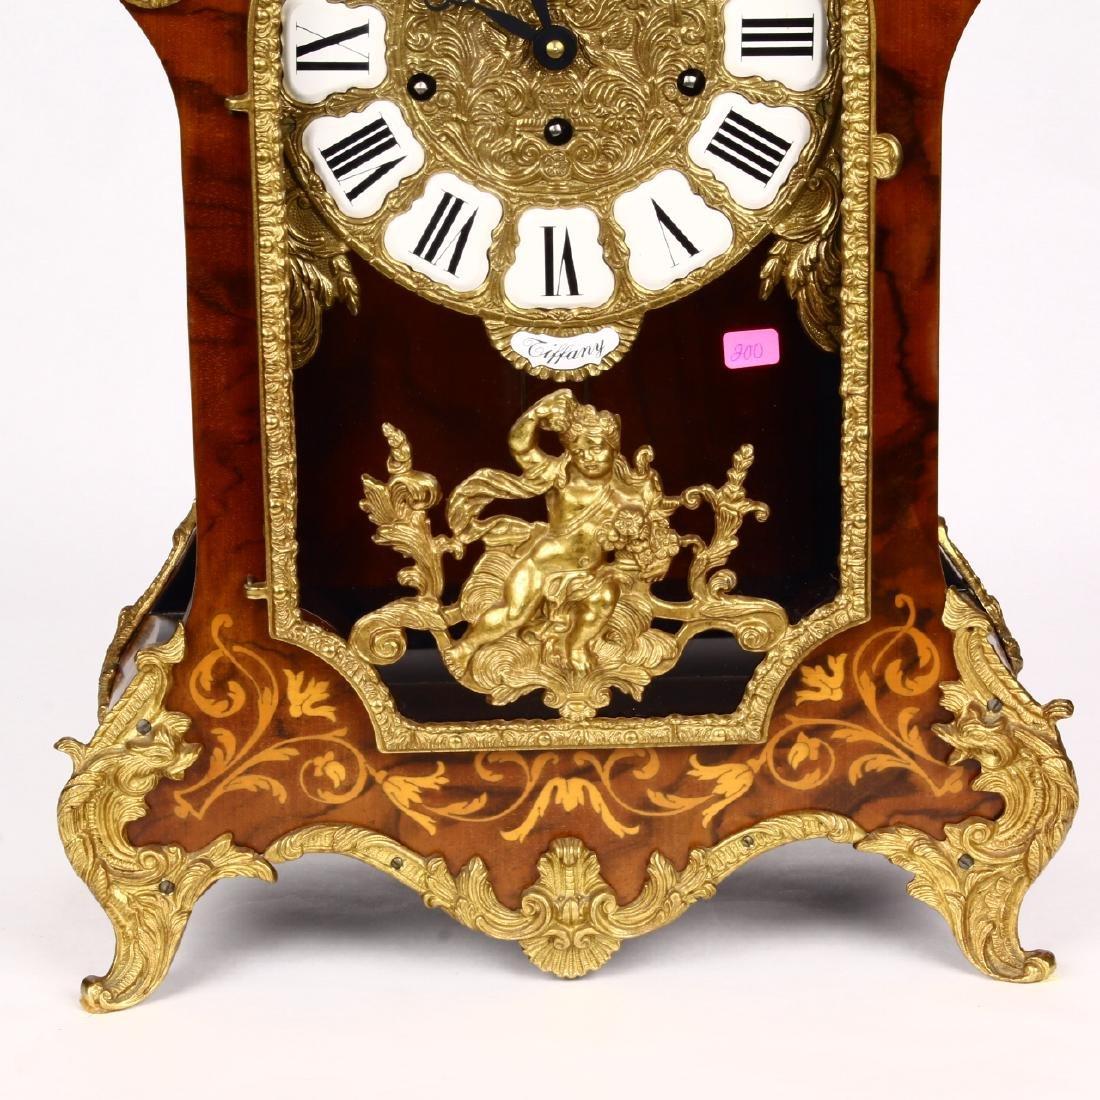 Tiffany Boulle Mantle Clock Brass Ormolu Cherubs Inlaid - 5